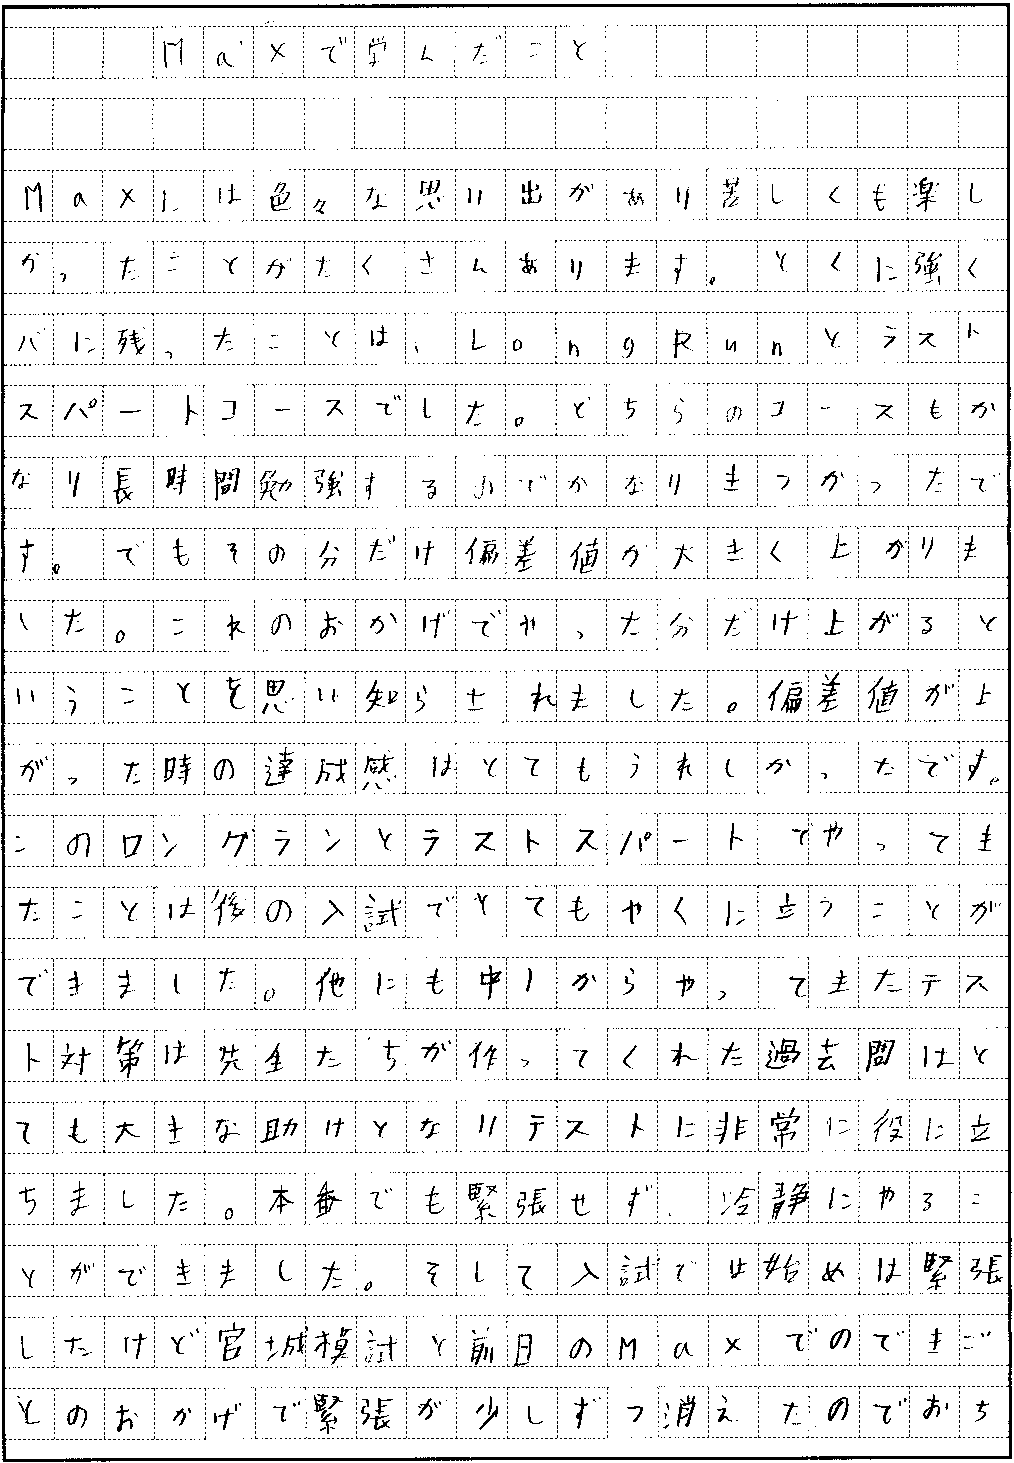 333-1